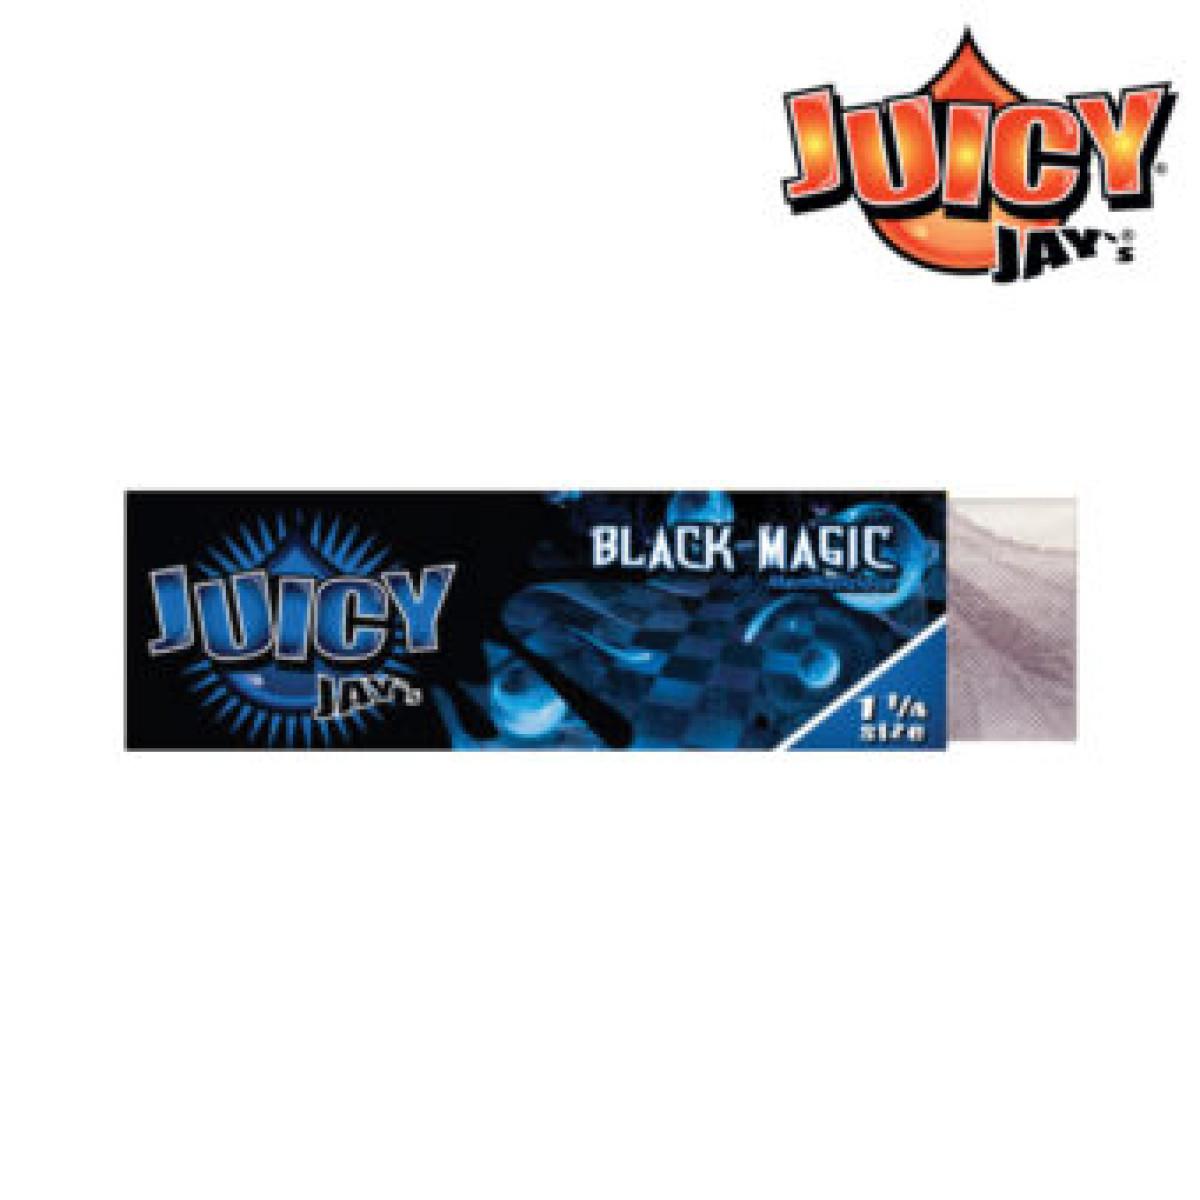 Black Magic Mentholicious Juicy Jay Papers 1 1/4